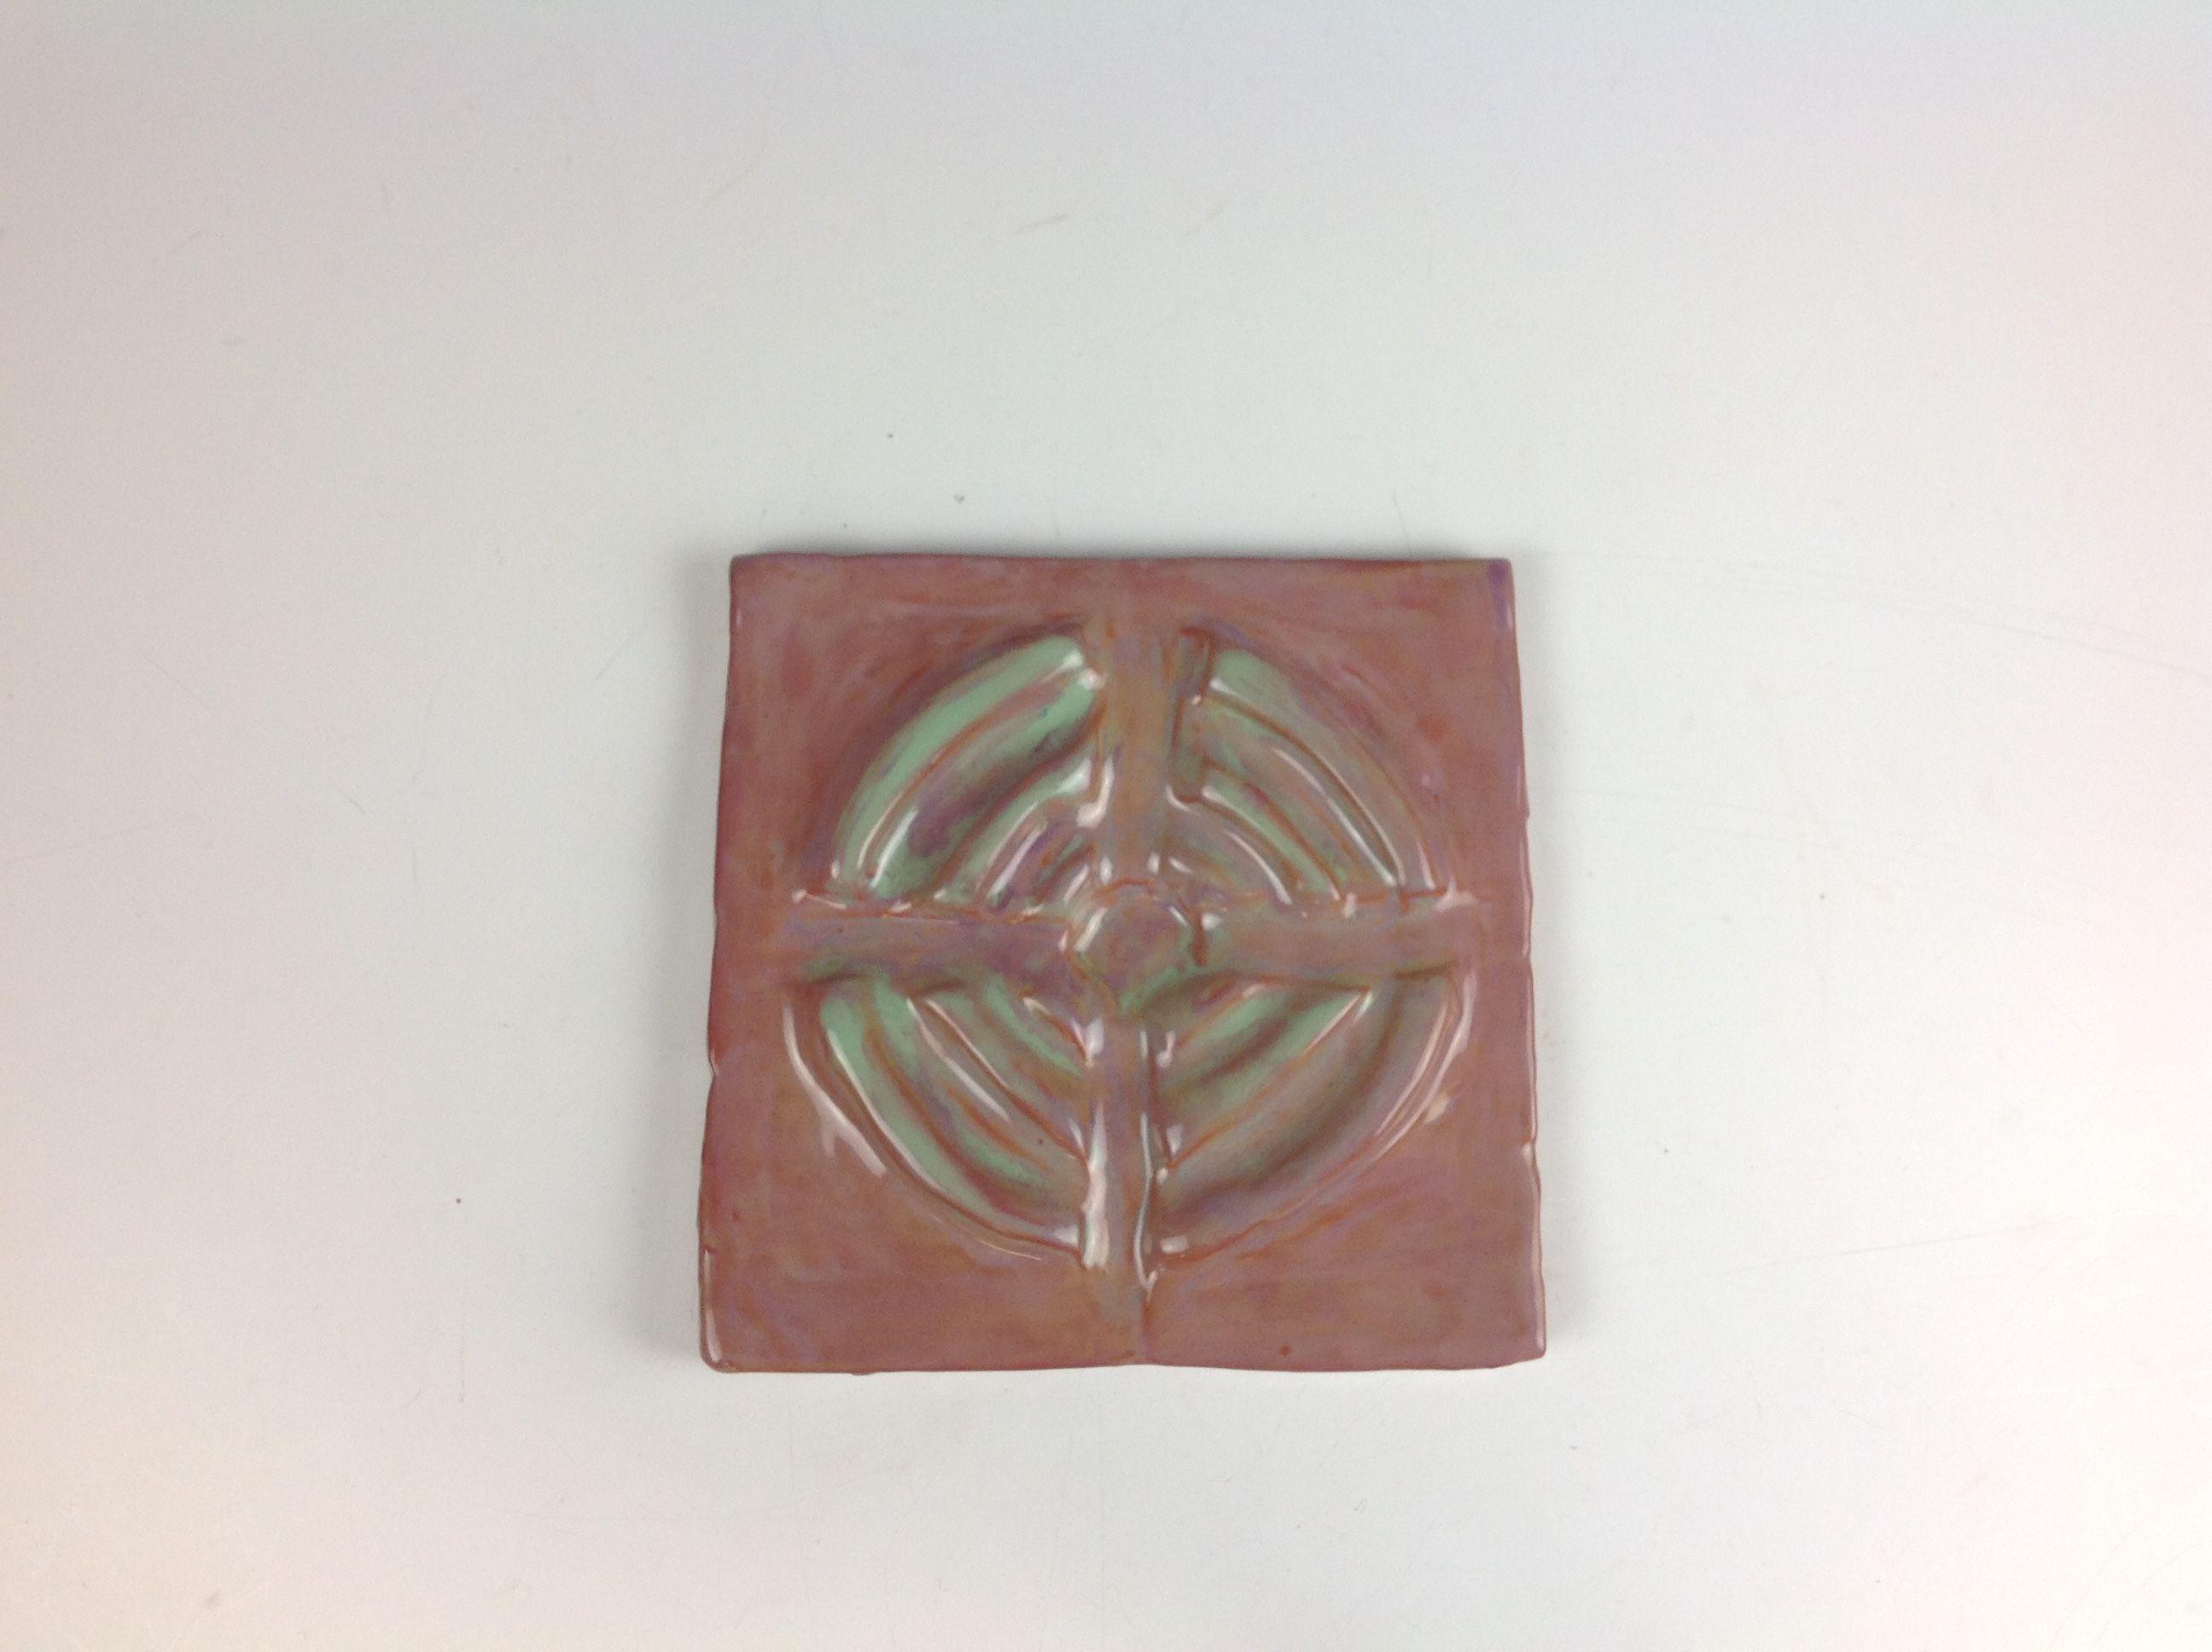 Glazed relief tile